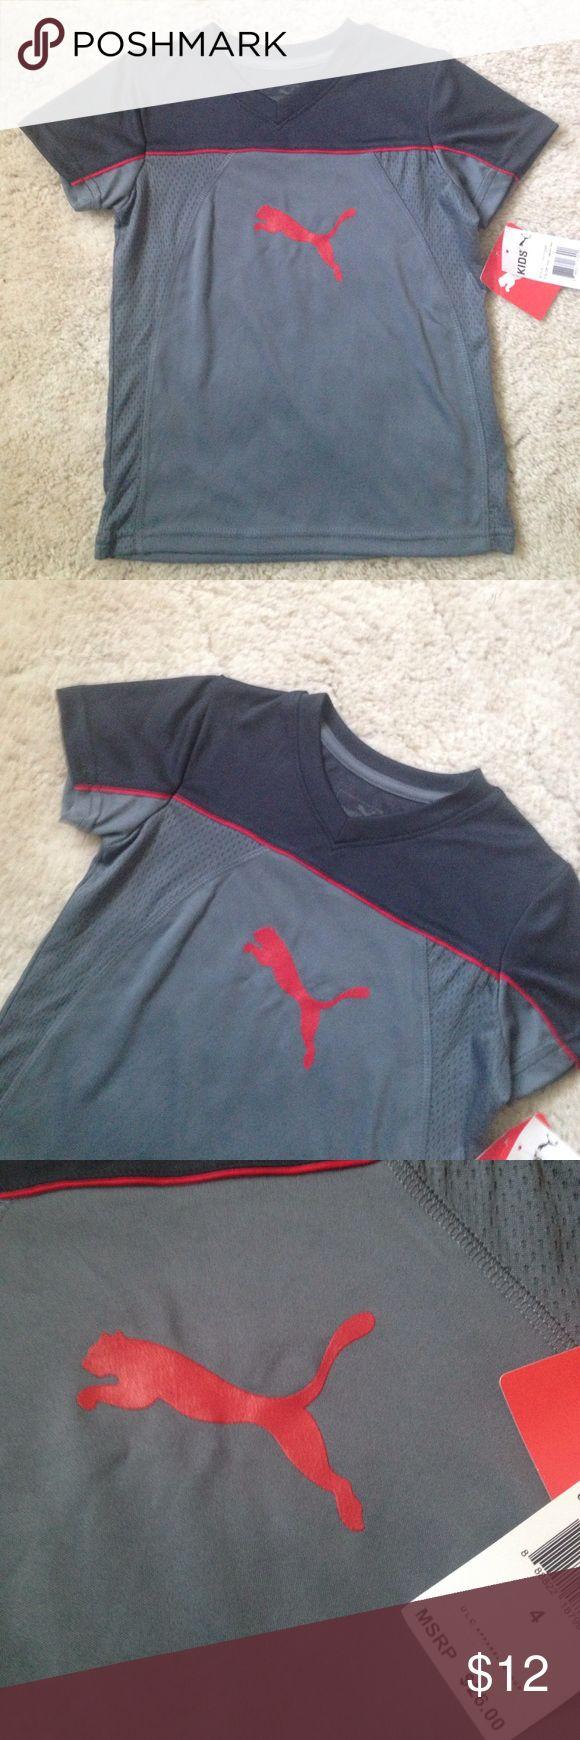 Puma shirt Puma shirt. Brand new with tag Puma Shirts & Tops Tees - Short Sleeve